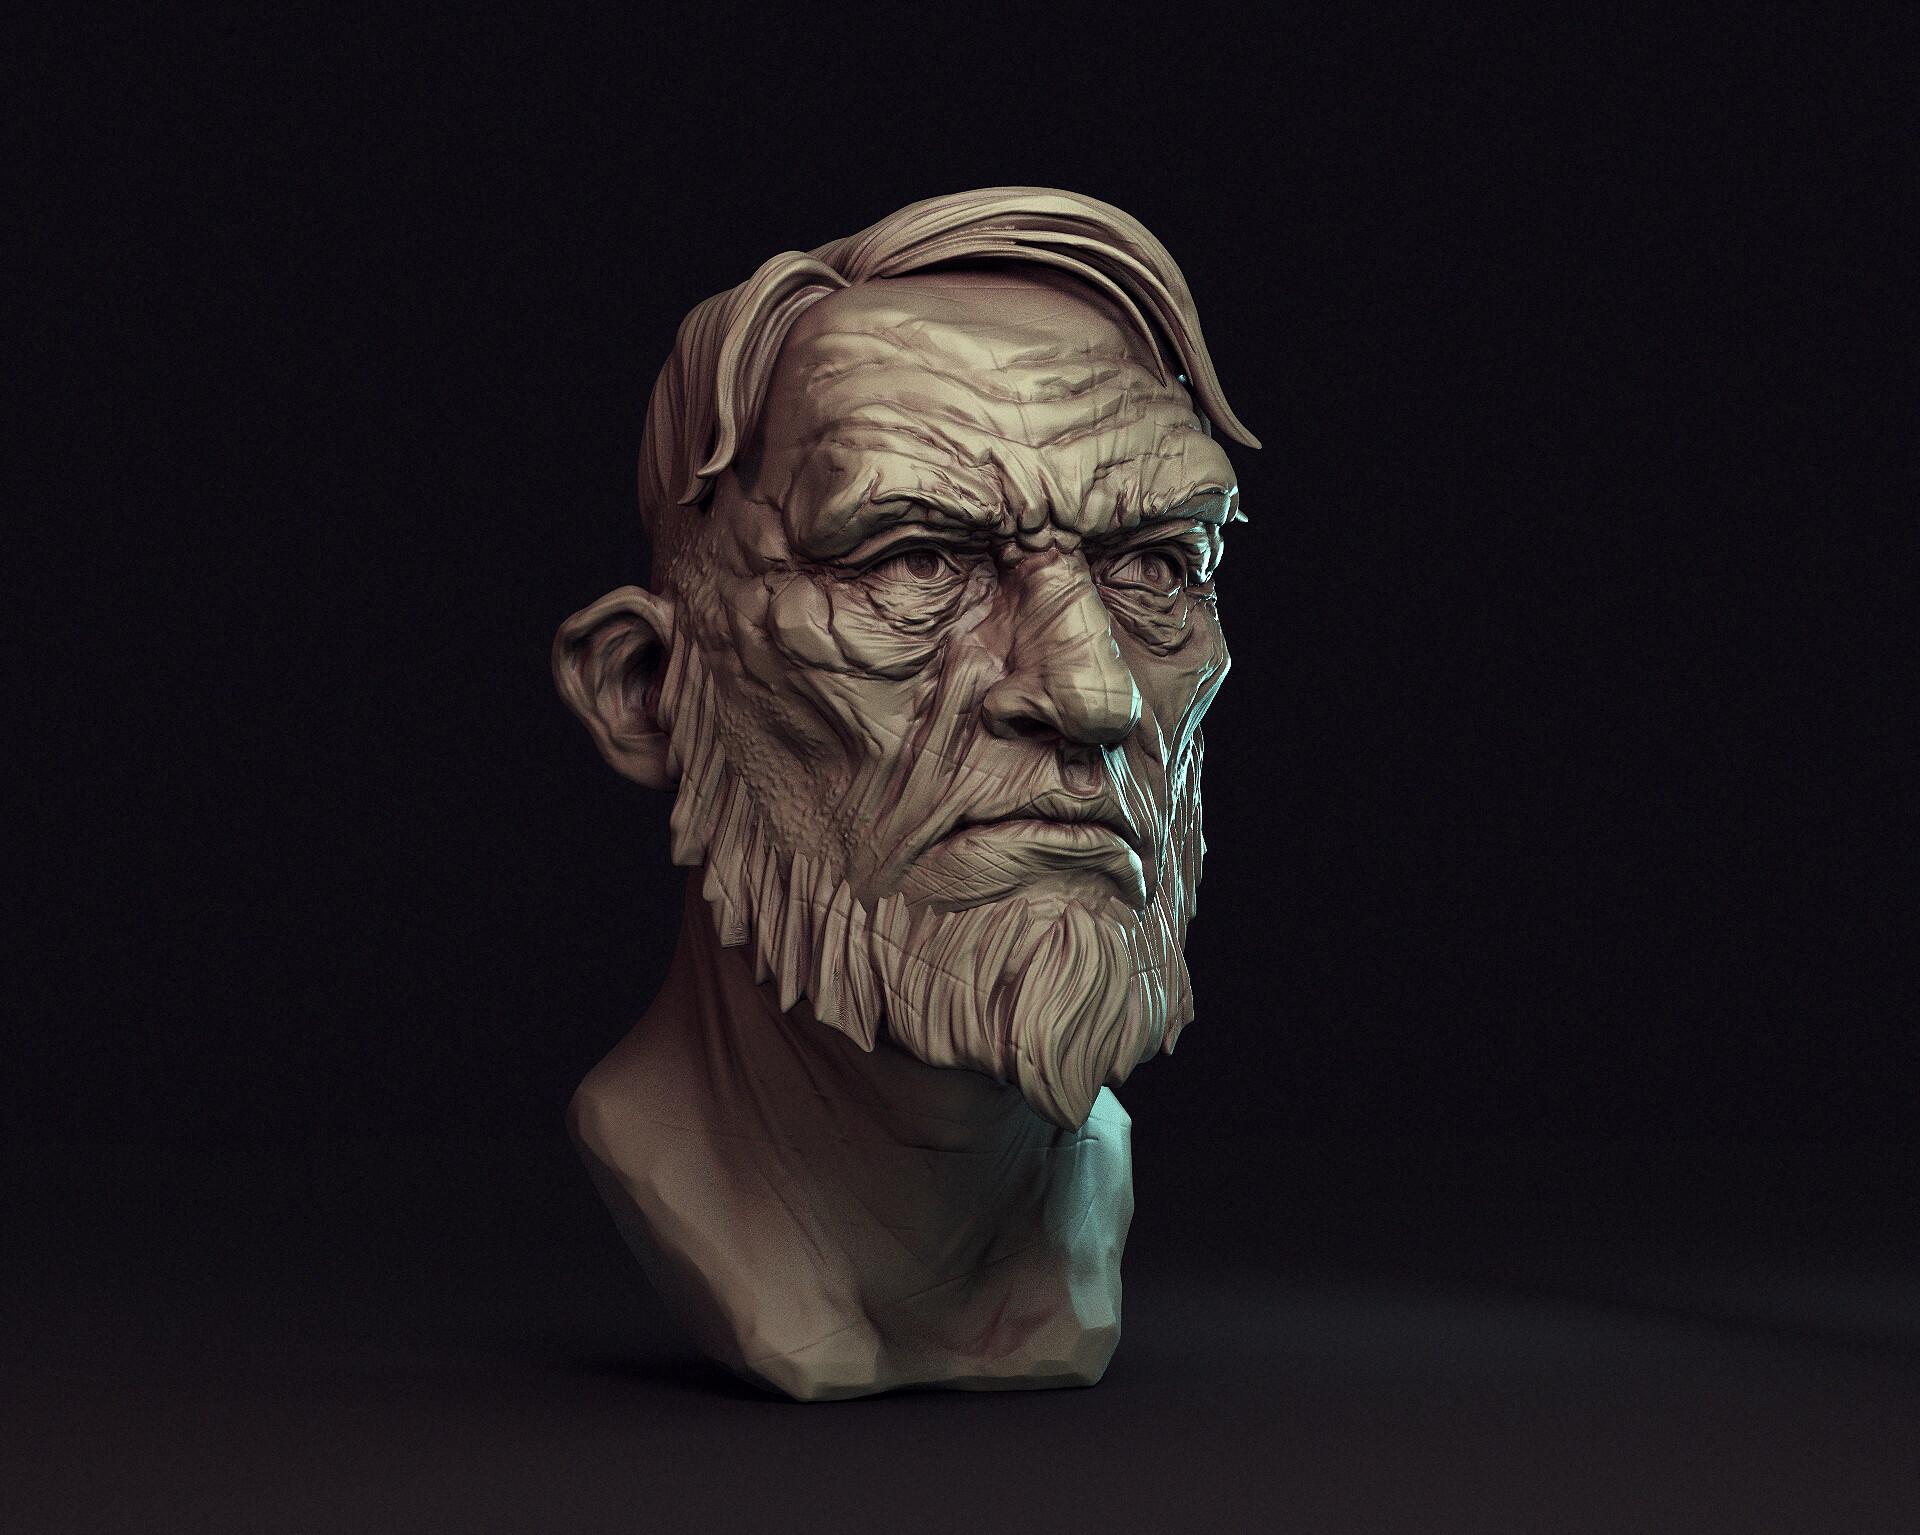 Artem bespalov old dude artstation01